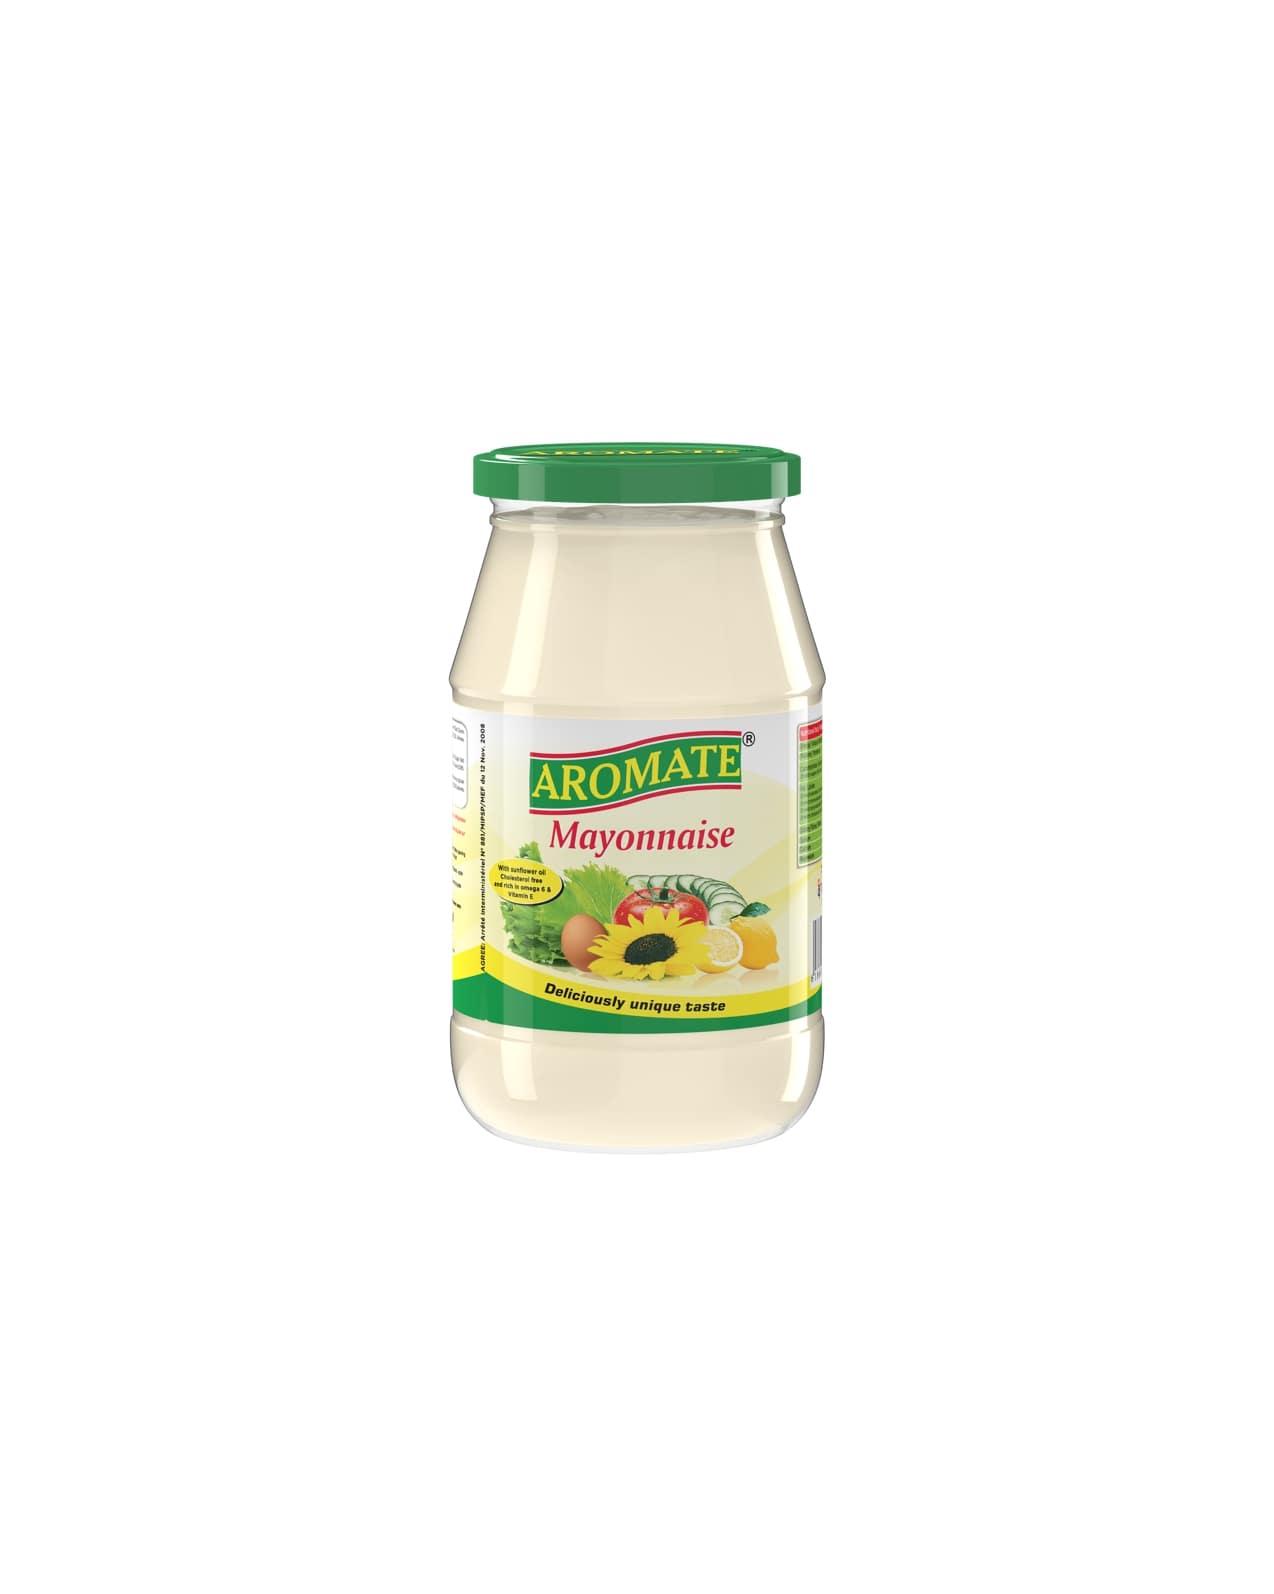 AROMATE_Mayonnaise_ 450ml (1)